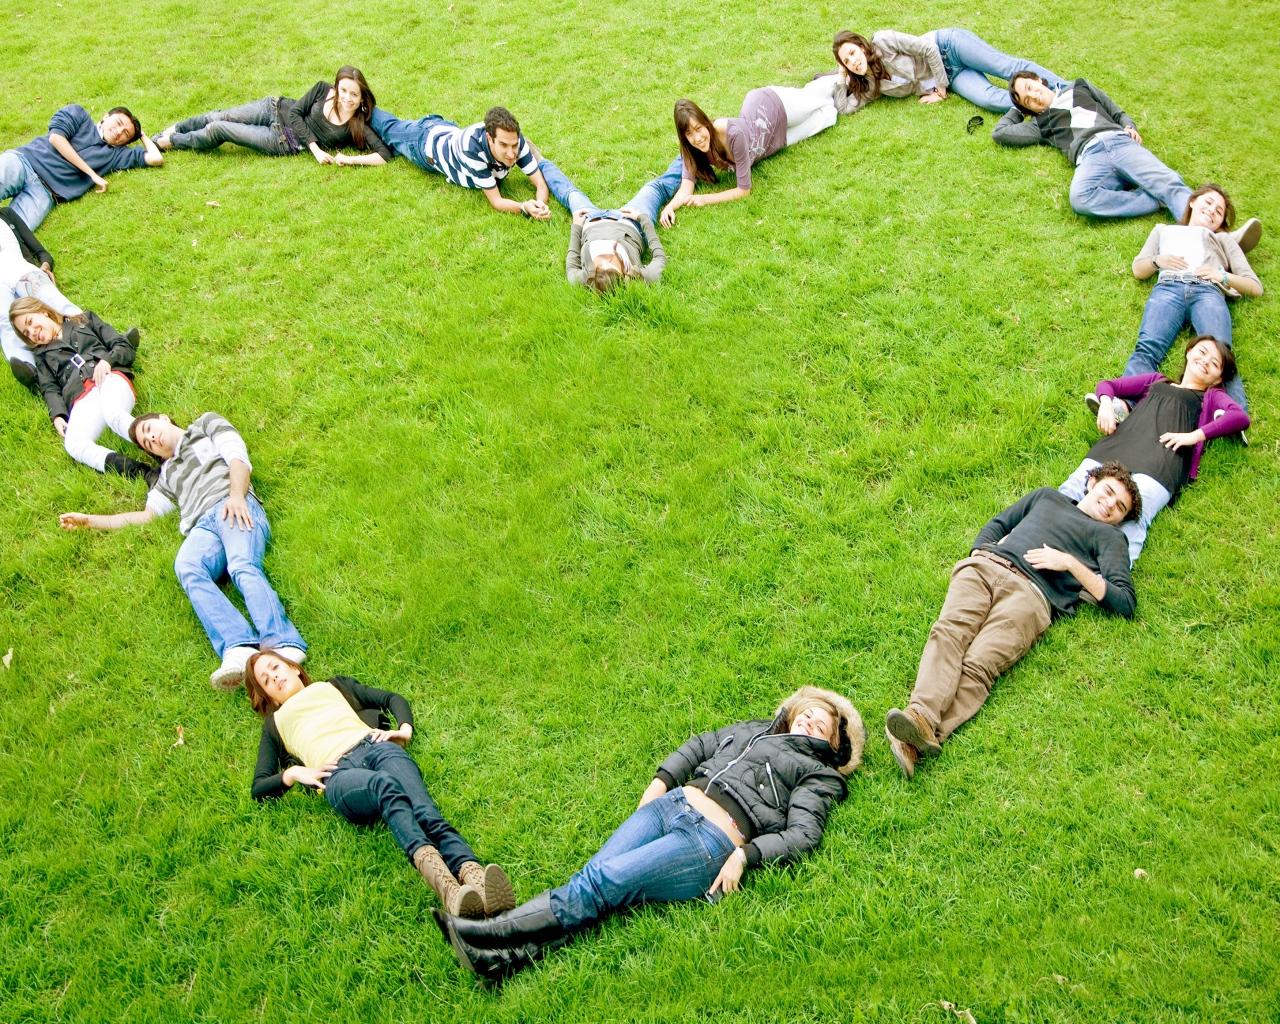 people_heart_grass_love_80424_1280x1024